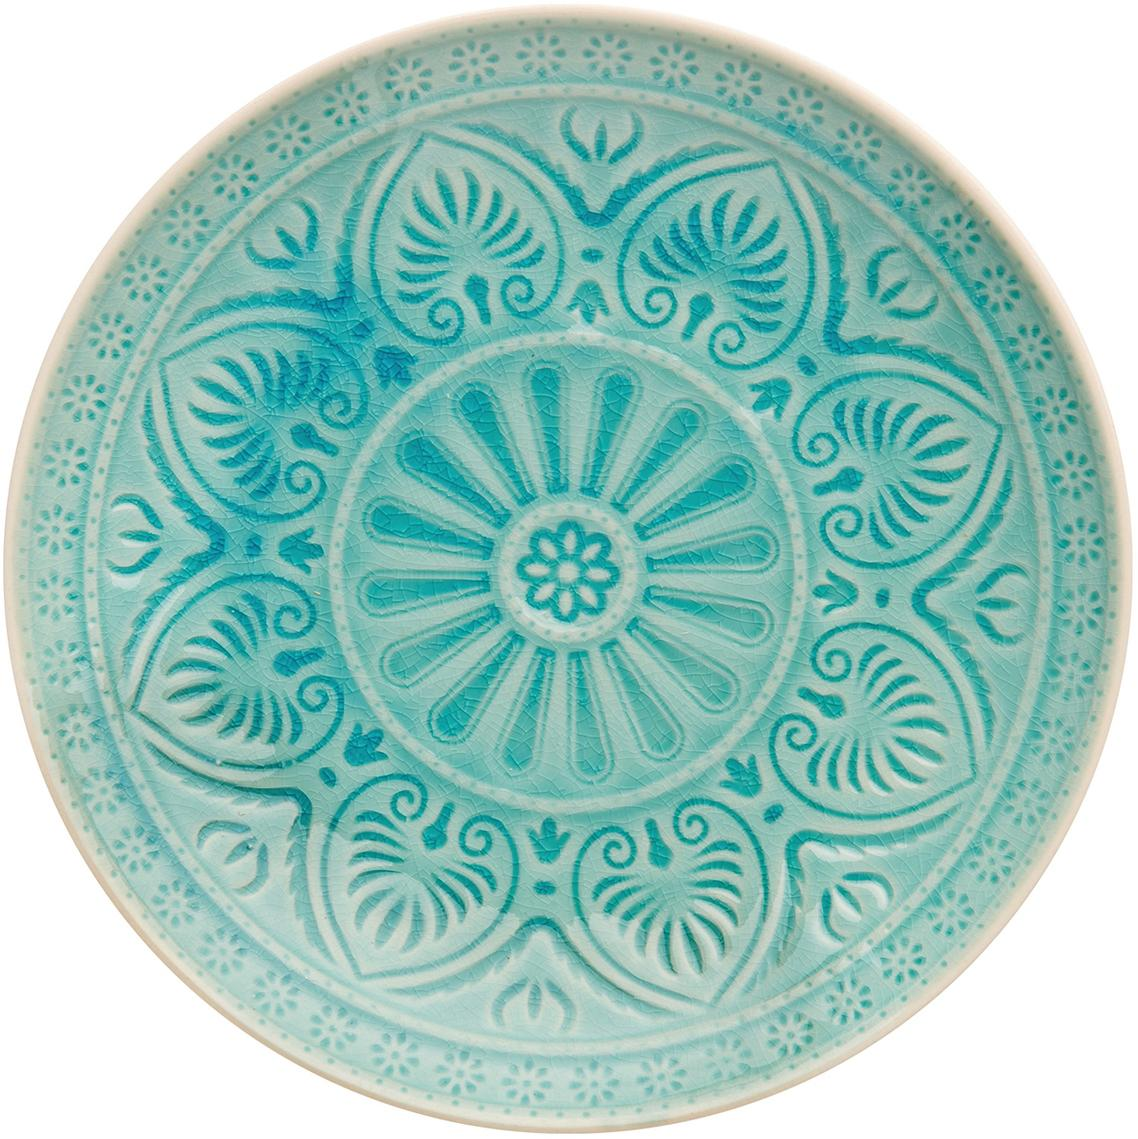 Plato postre artesanales Sumatra, Gres, Turquesa, Ø 21 cm